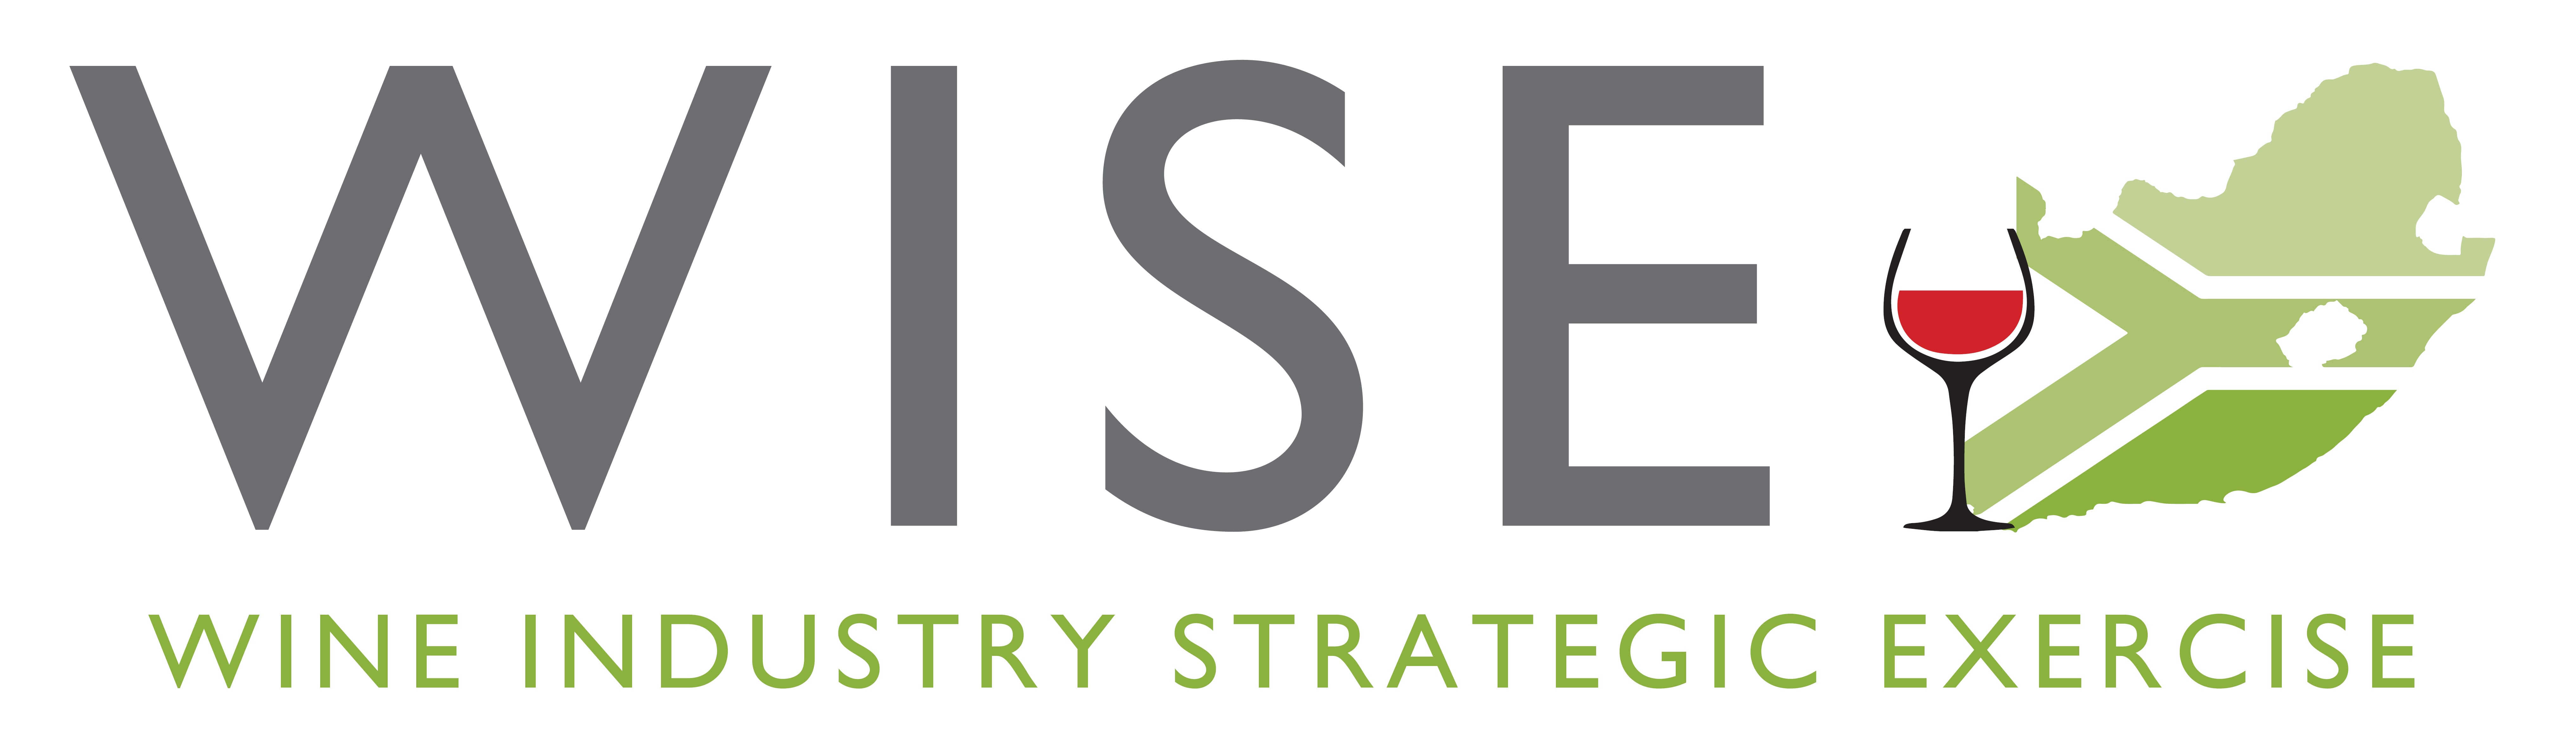 wise_logo